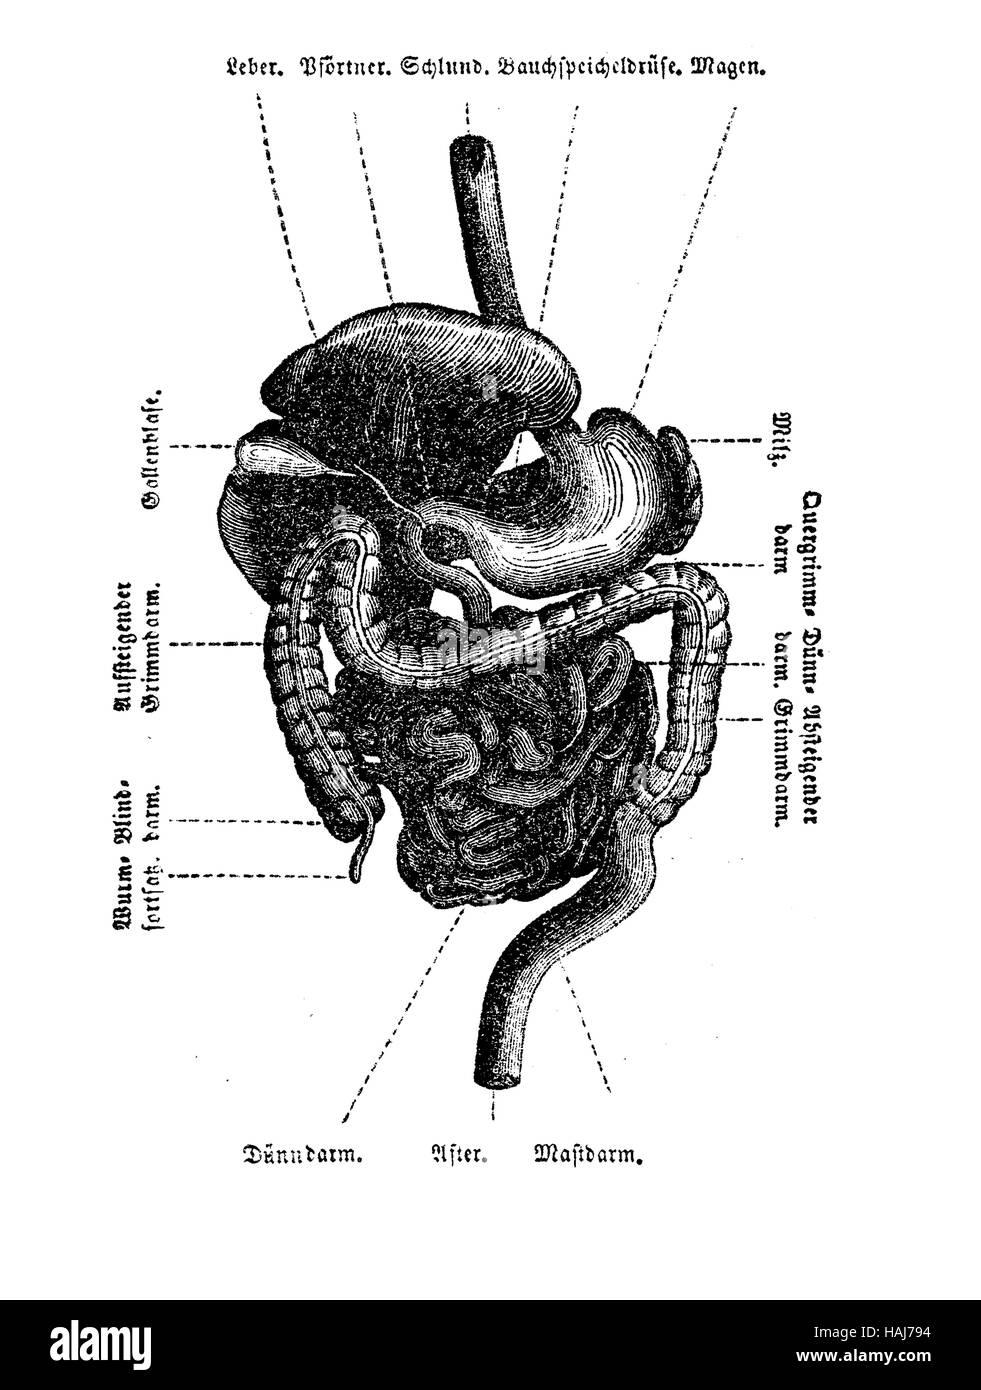 Anatomie, Unterleib Hohlraum Organe Tabelle, Gravur XIX. Jh ...